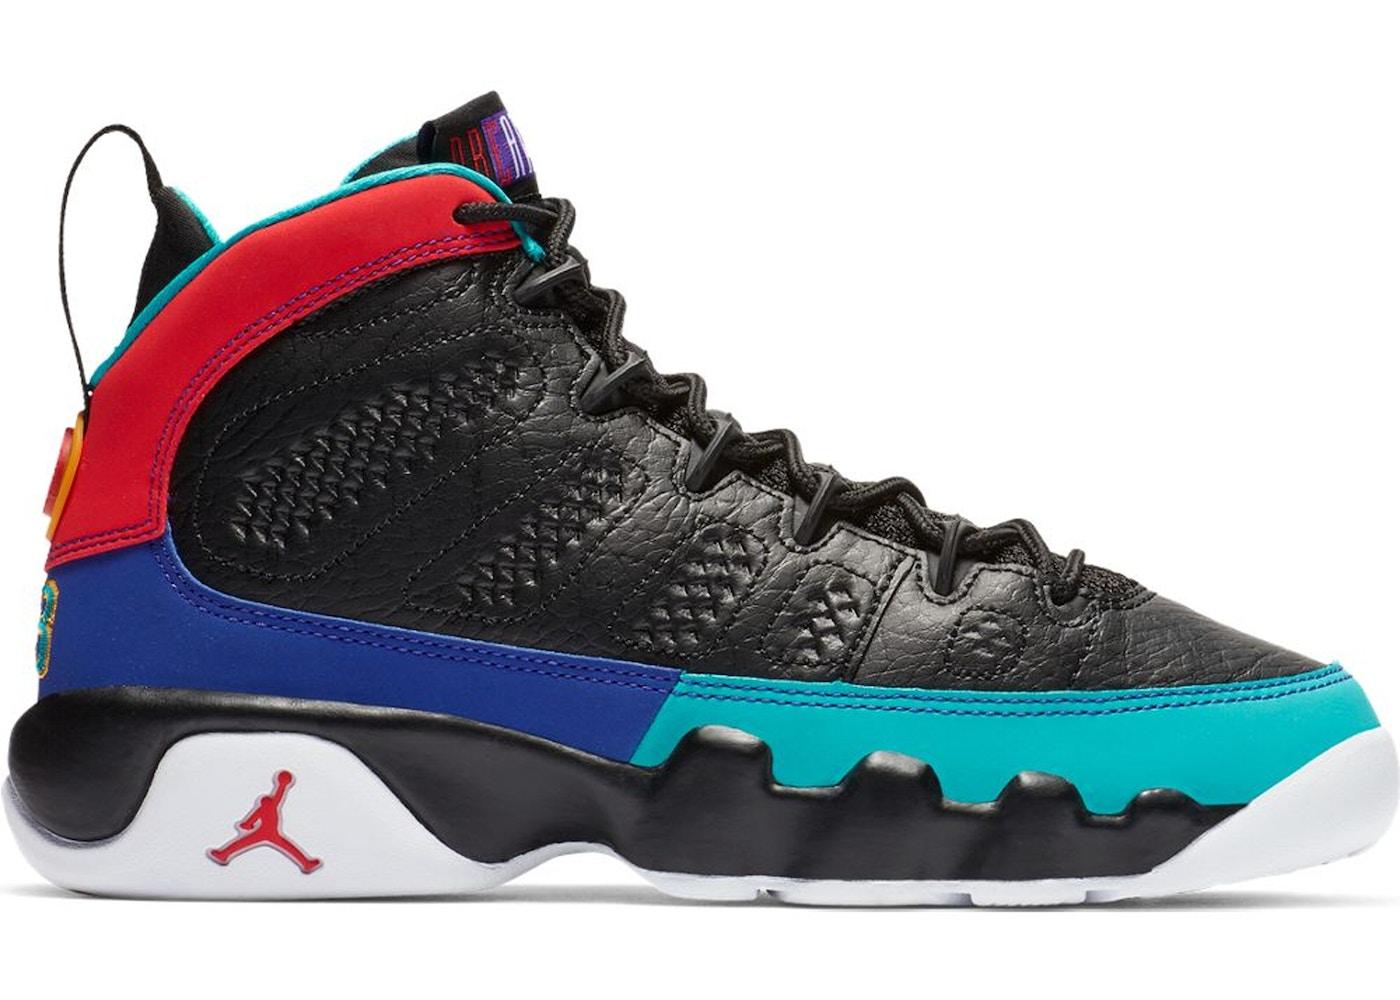 cheap for discount ed5b7 01c5f Buy Air Jordan 9 Shoes   Deadstock Sneakers